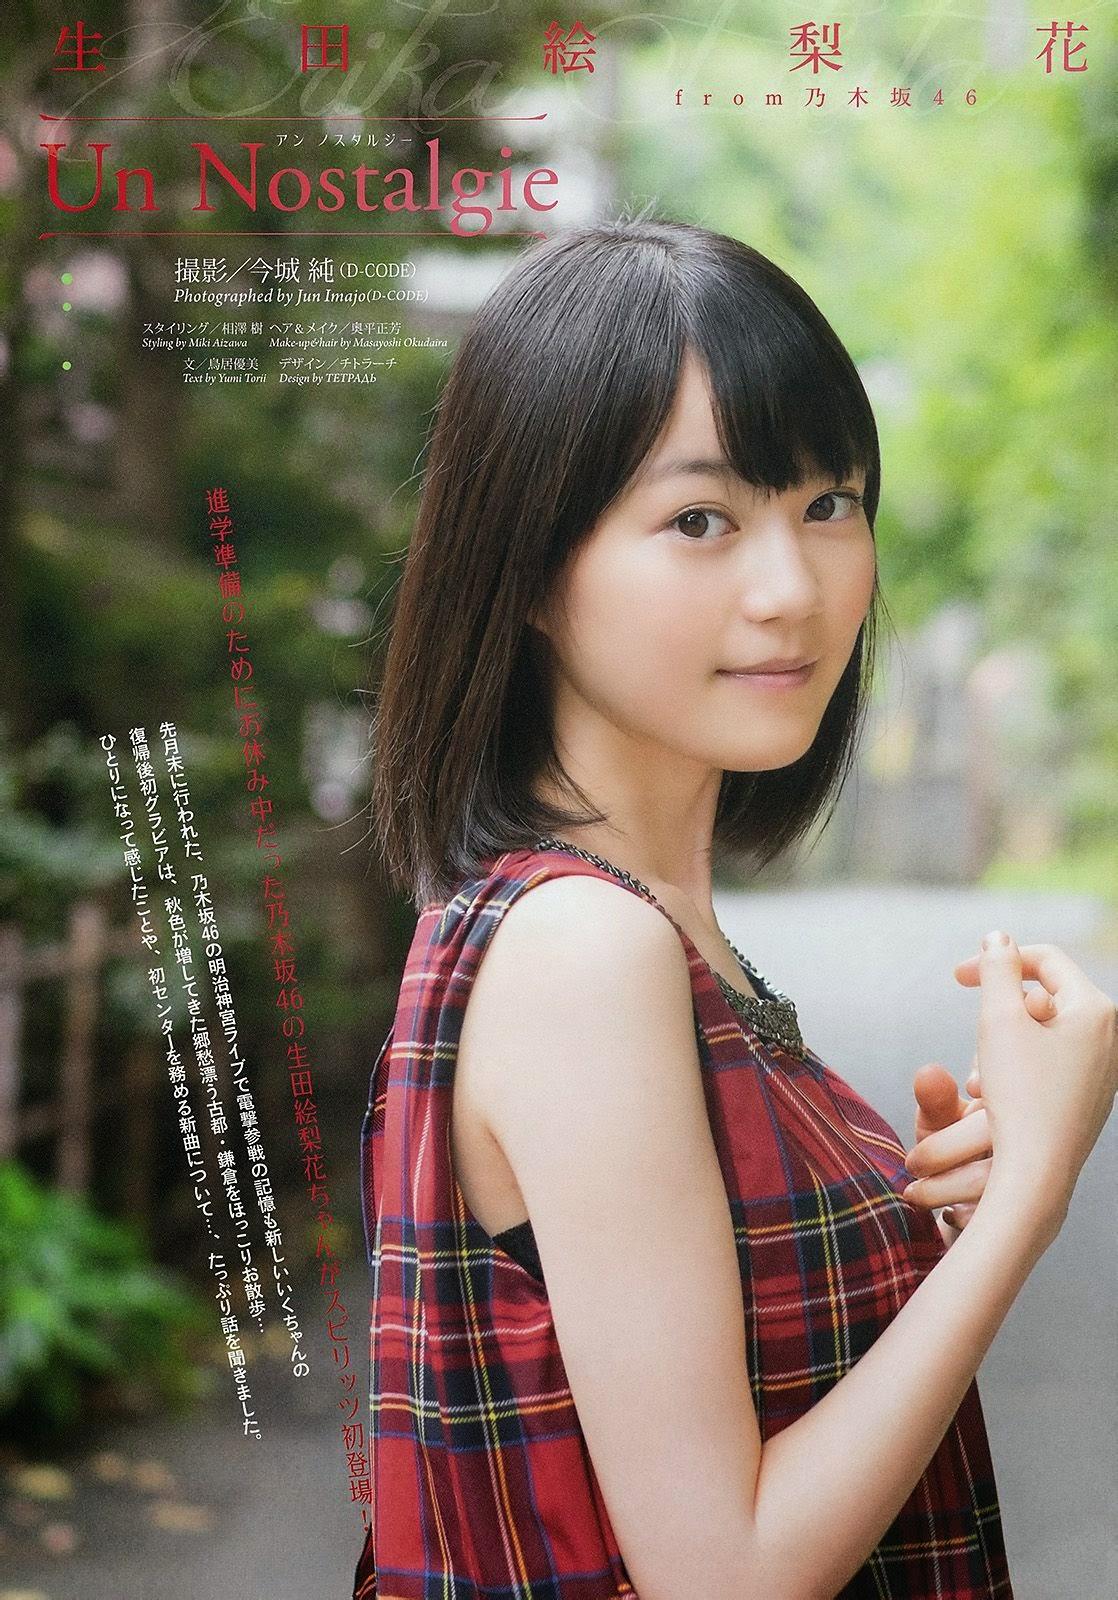 生田絵梨花の画像 p1_16